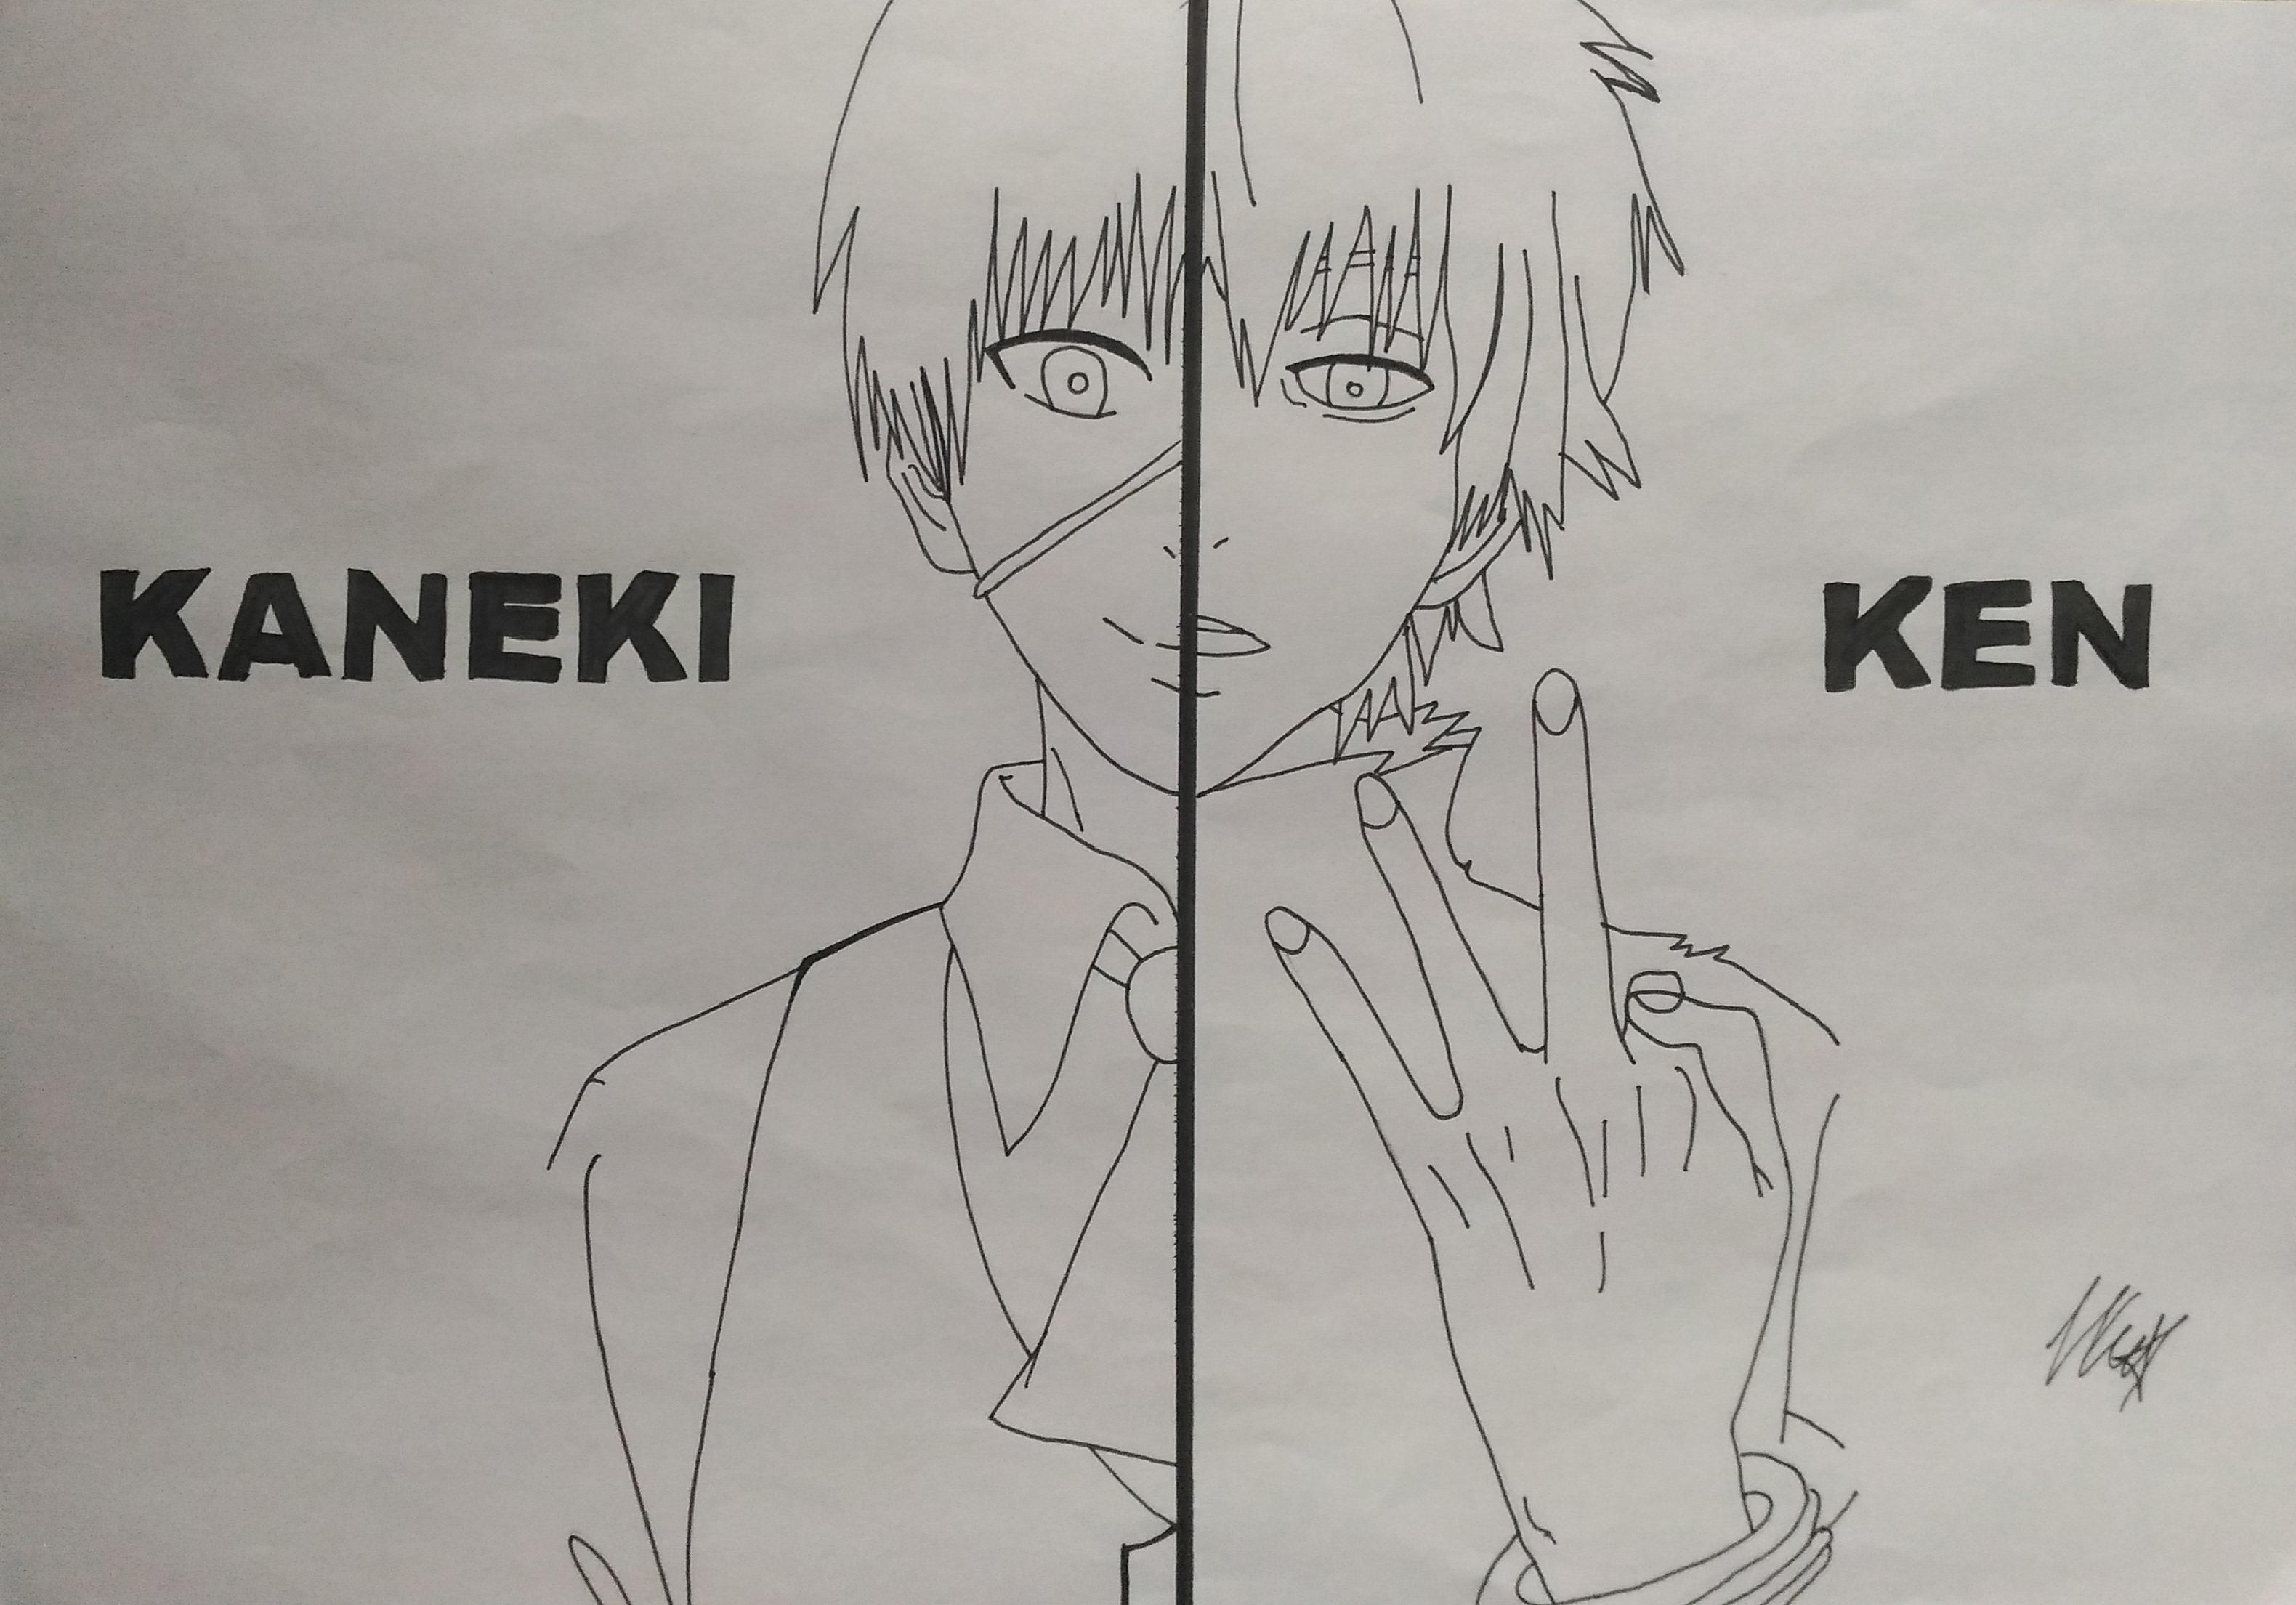 Line Art Anime : Kaneki ken lineart tokyo ghoul by mishoka on deviantart